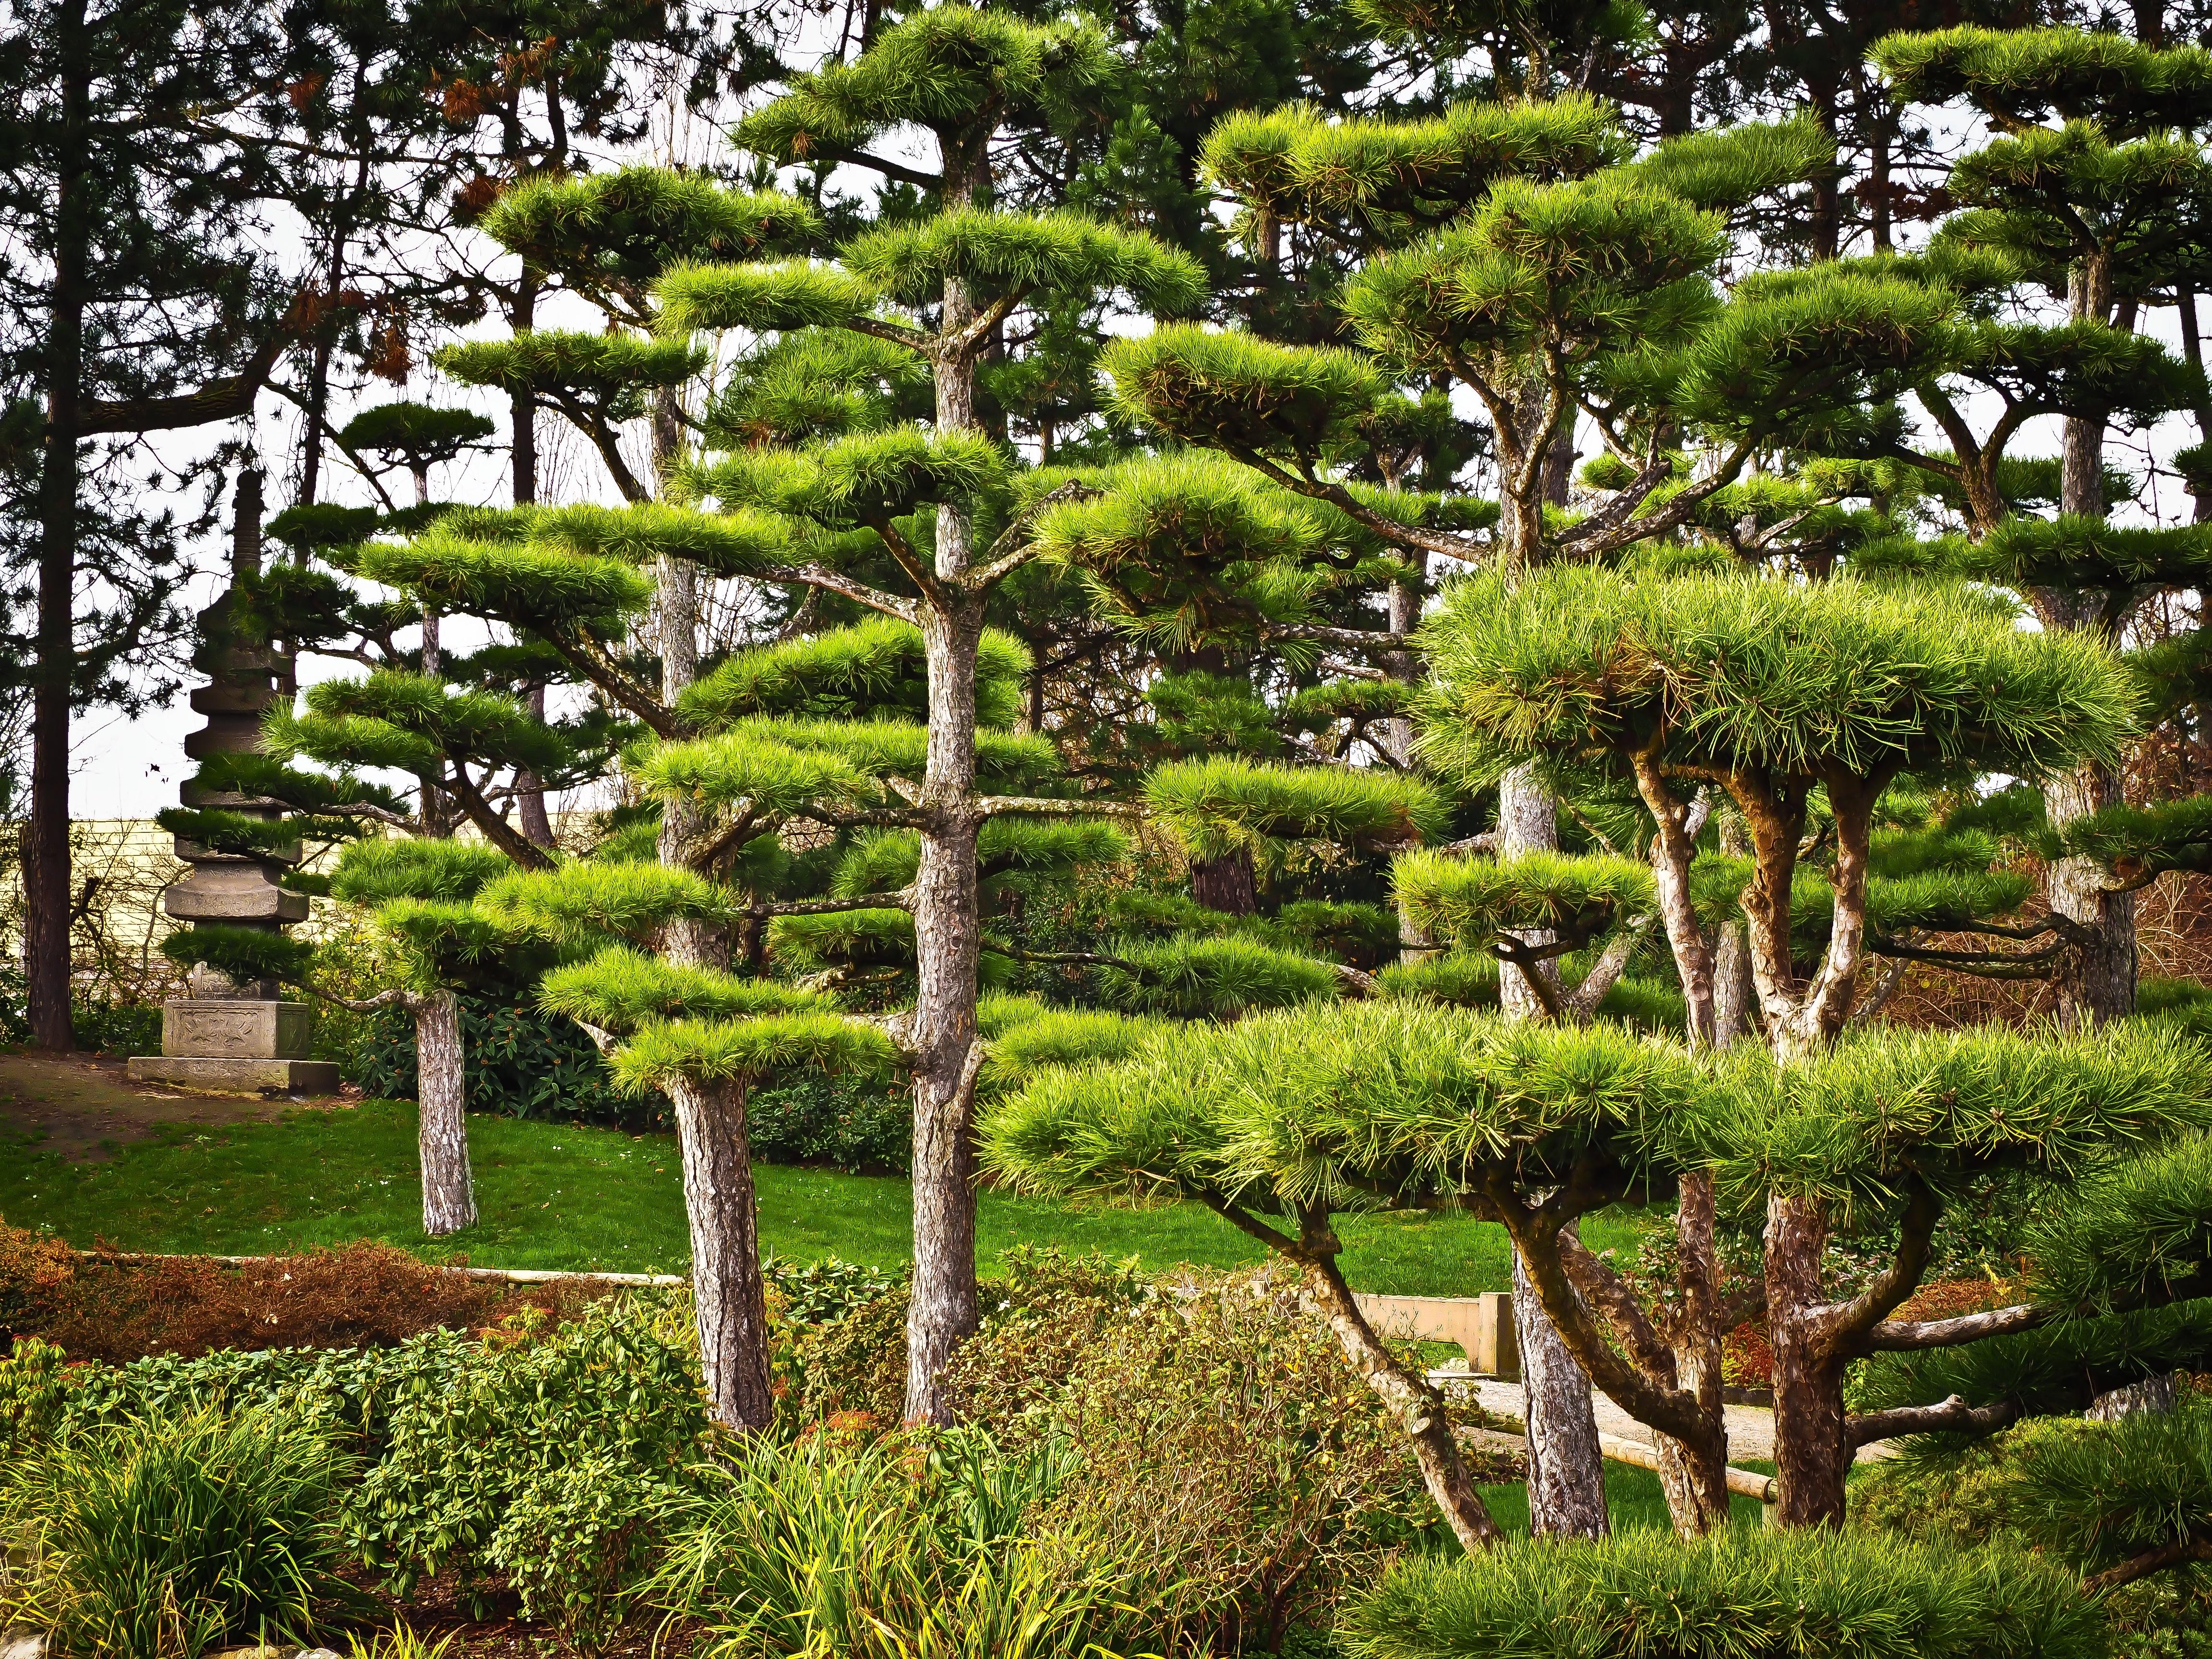 free images landscape tree nature flower evergreen park